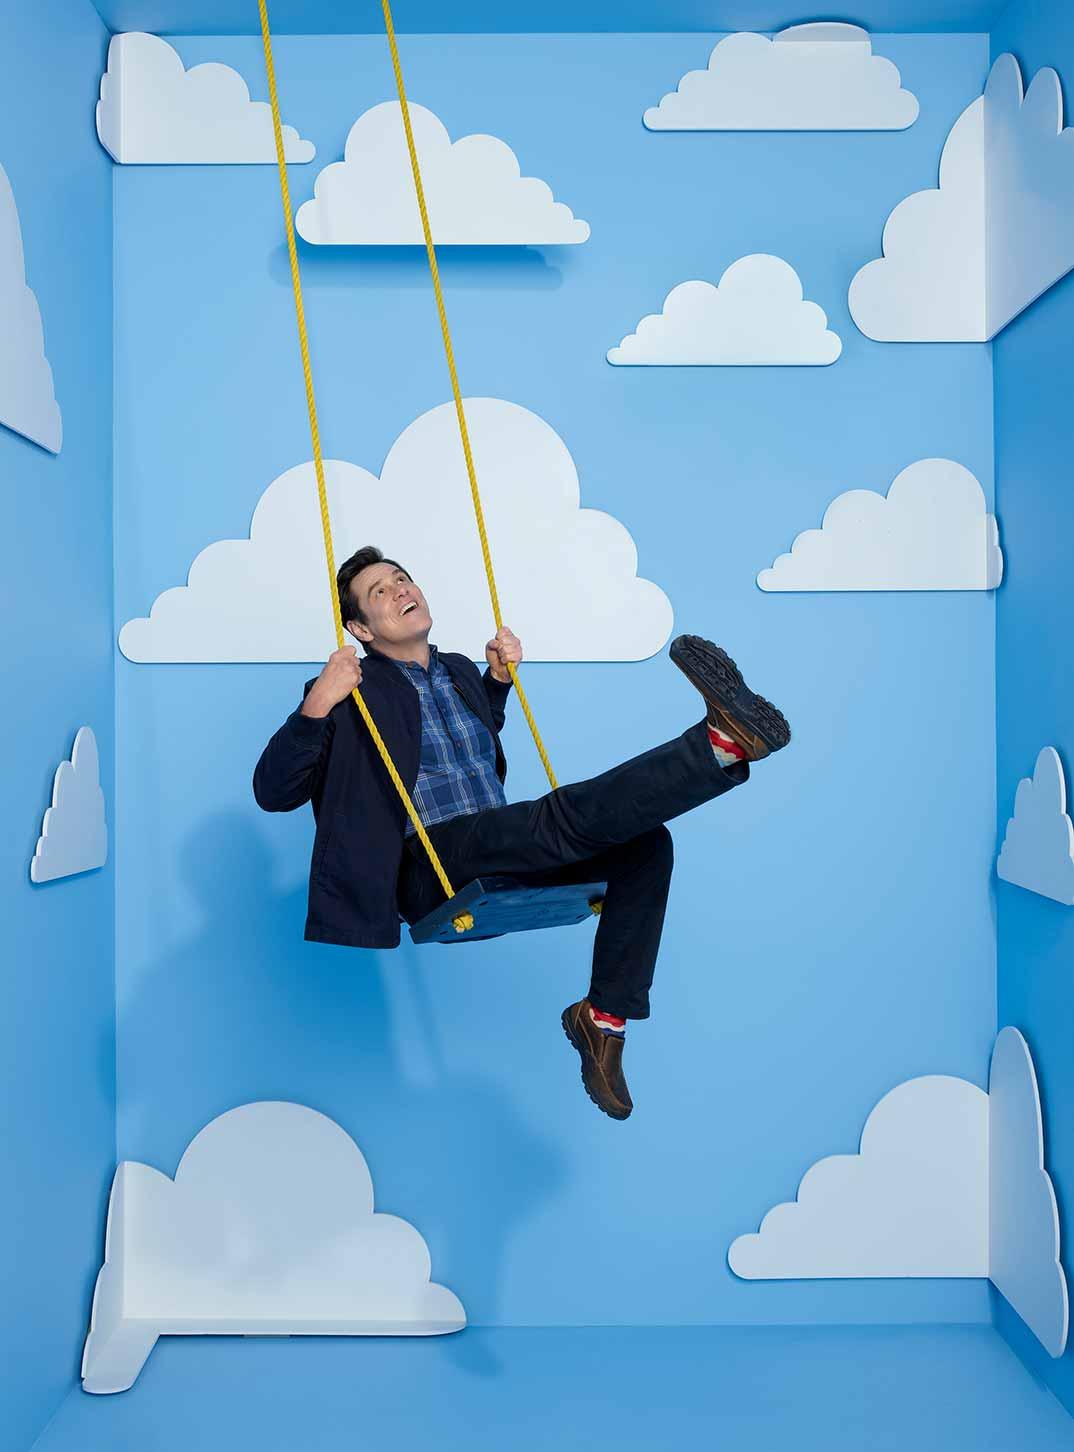 Jim Carrey - Kidding © Movistar+